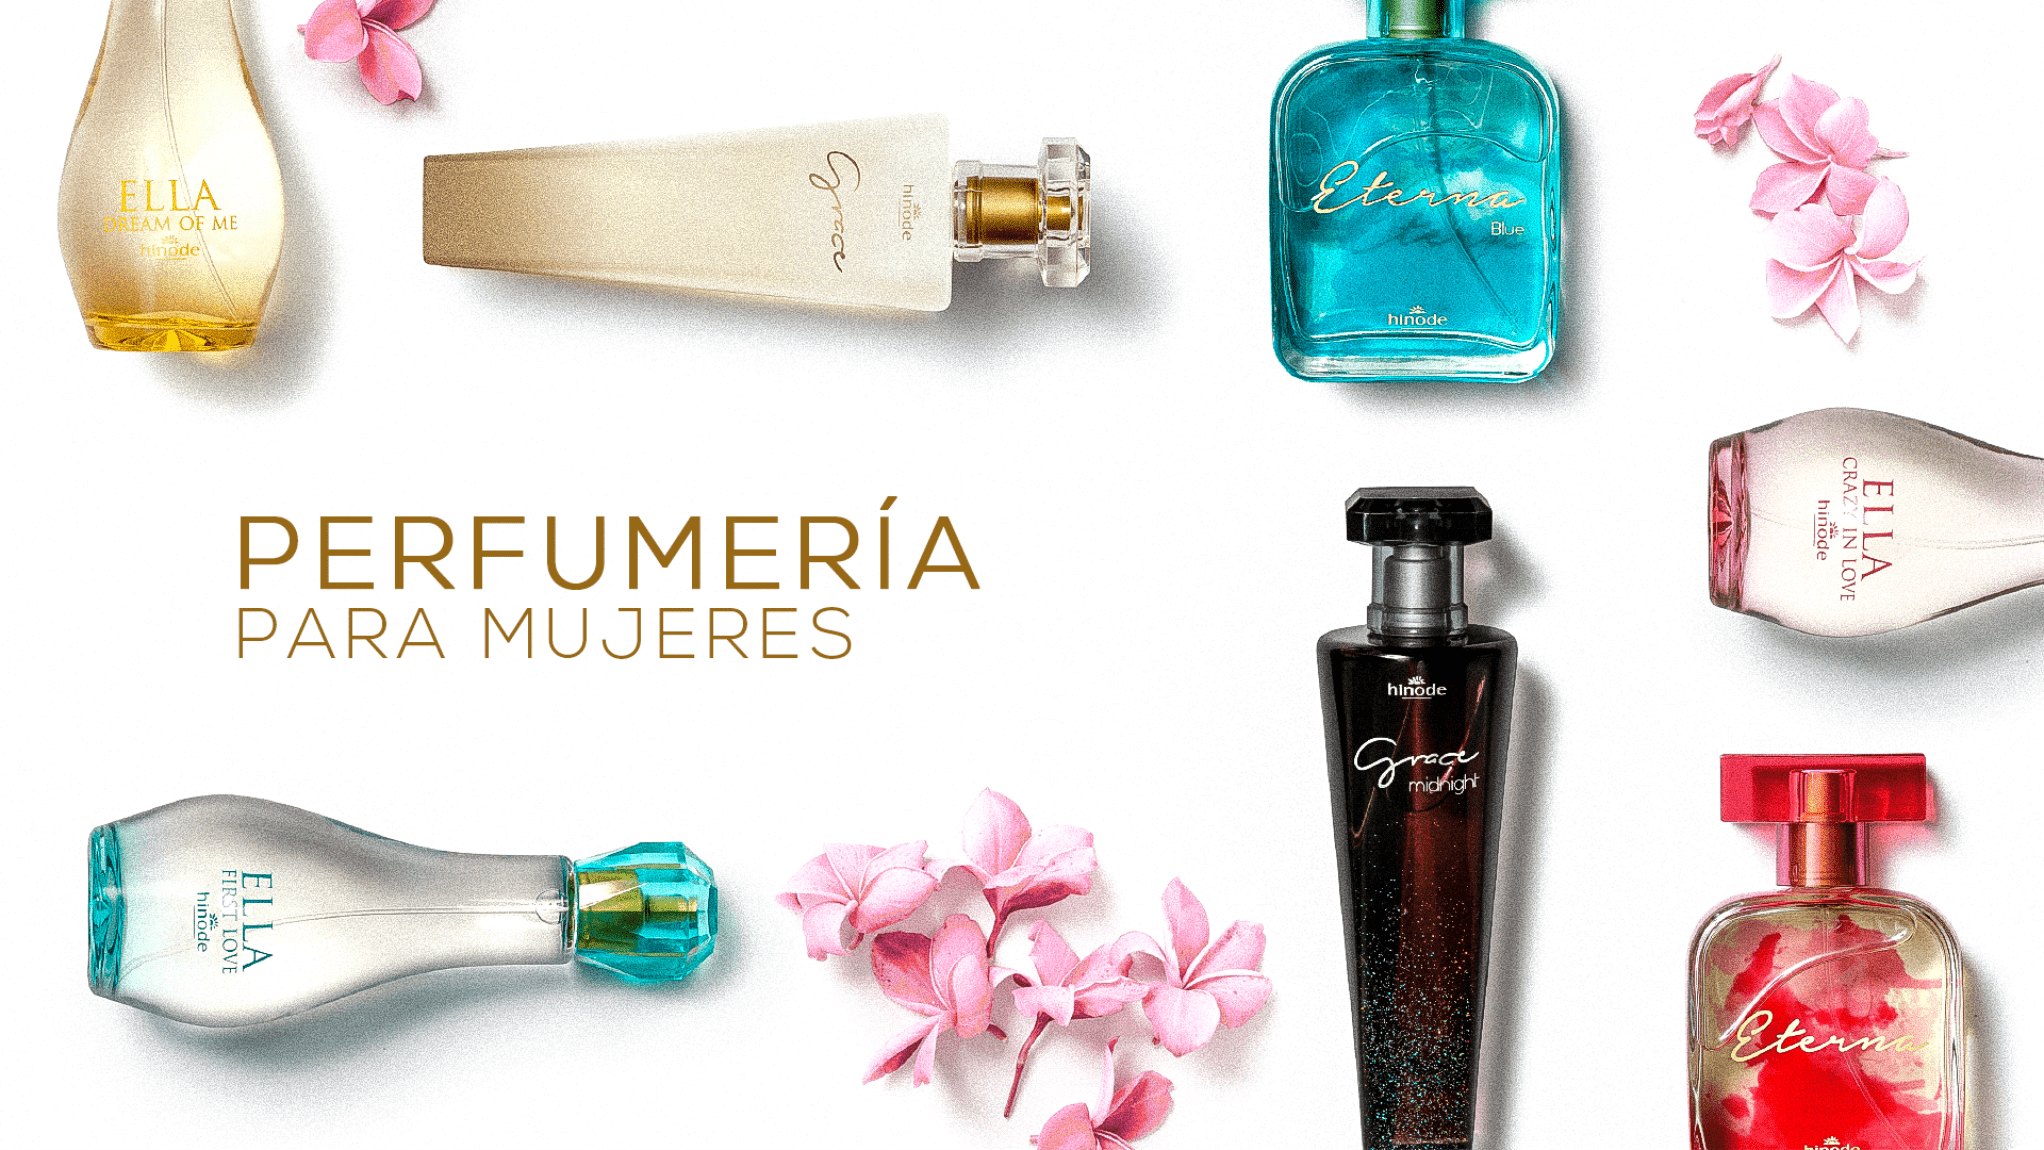 Perfumería Mujer Grupo Hinode